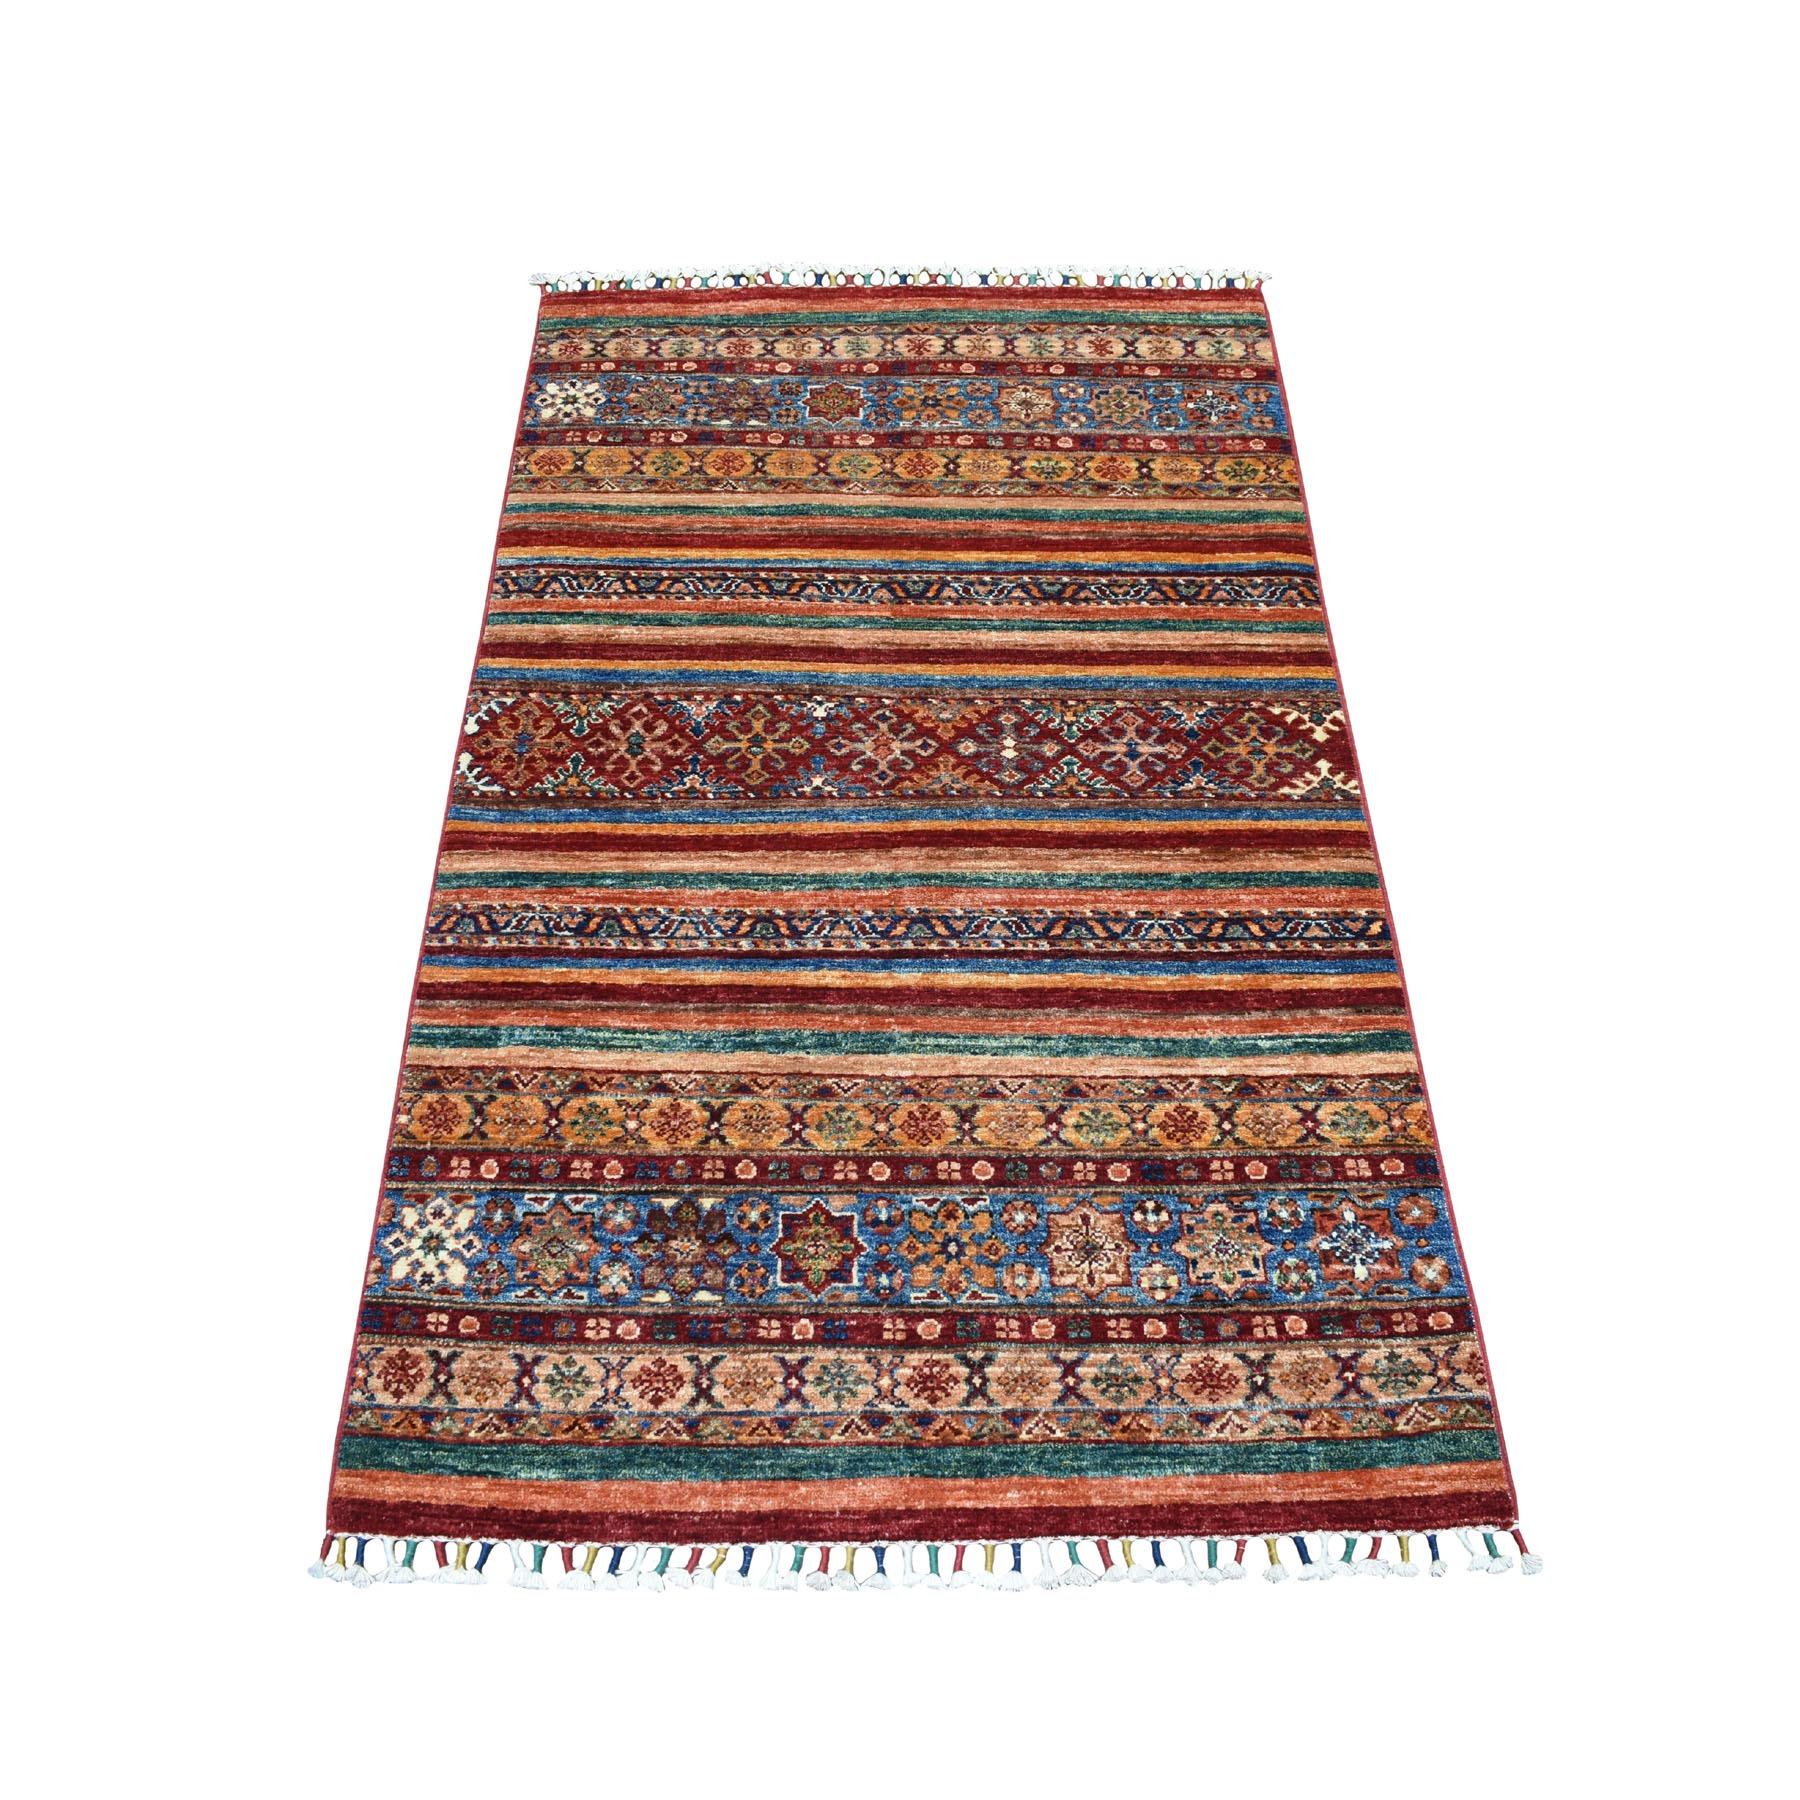 3'X5' Khorjin Design Colorful Super Kazak Pure Wool Hand Knotted Oriental Rug moaebed9